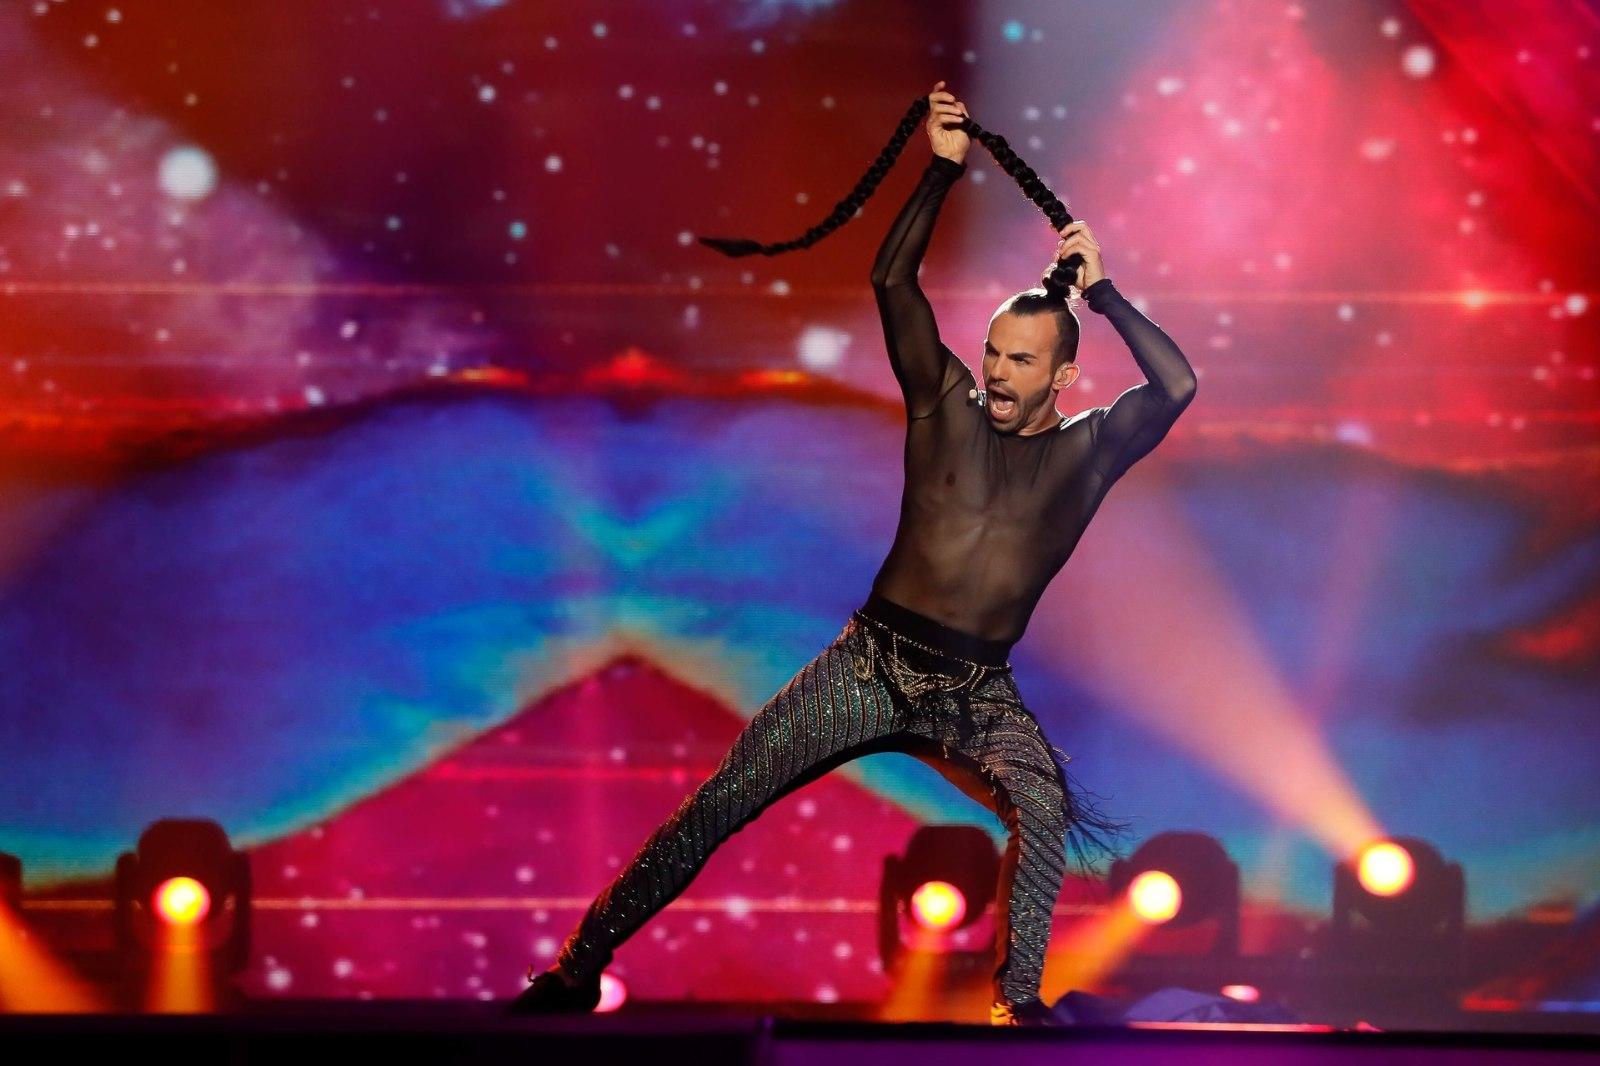 3d2a1d2b0c4 Montenegro eurolaulik kiidab Daniel Levi näosaate paroodiat | Õhtuleht